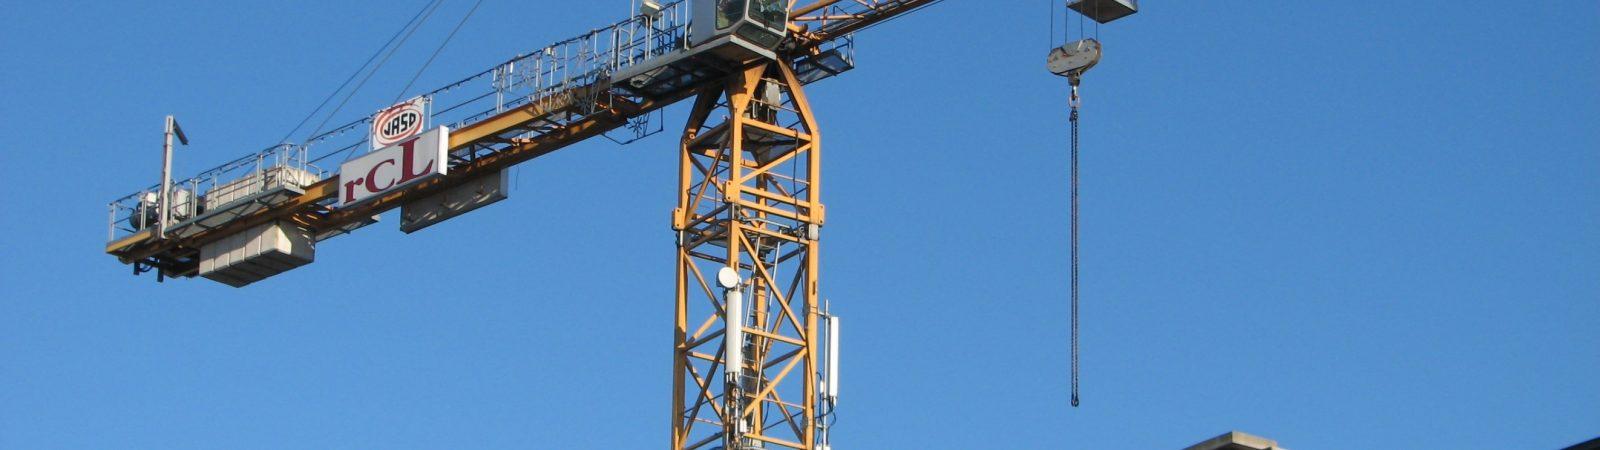 Tower Crane Construction